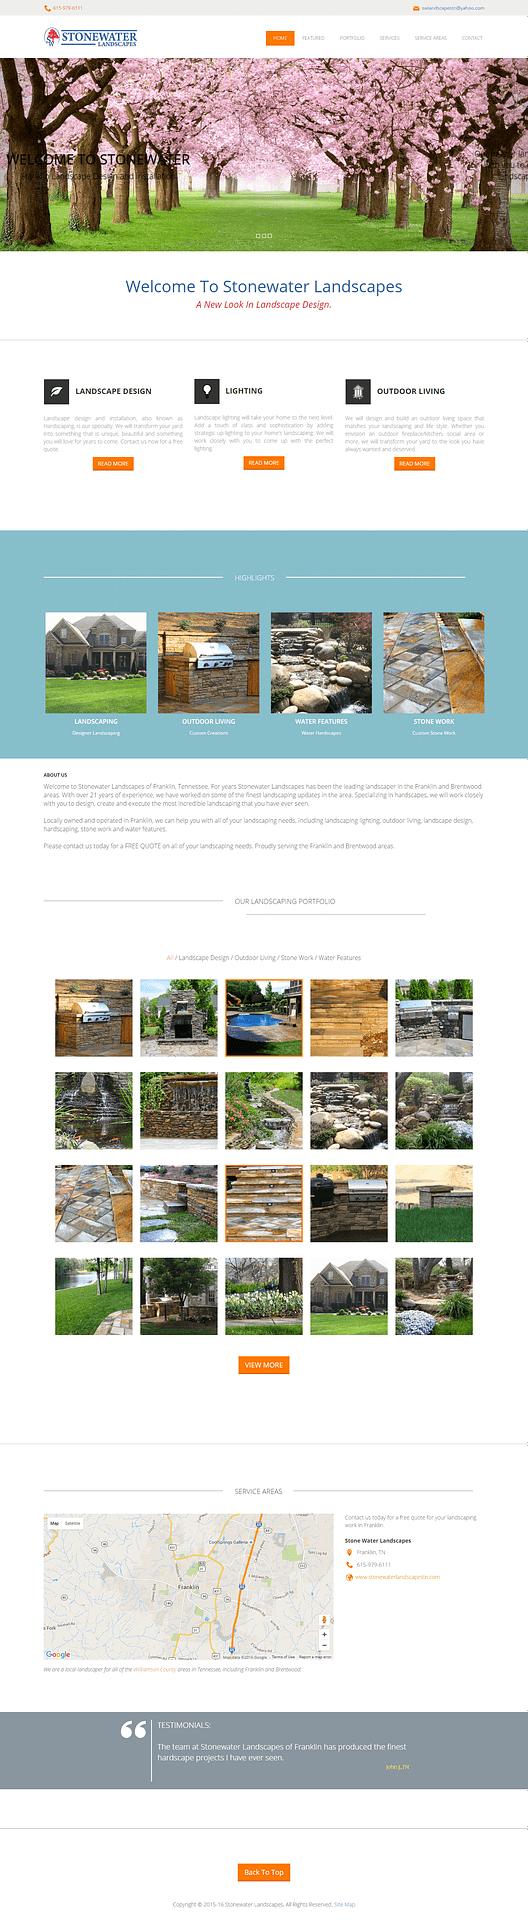 Stonewater Landscape